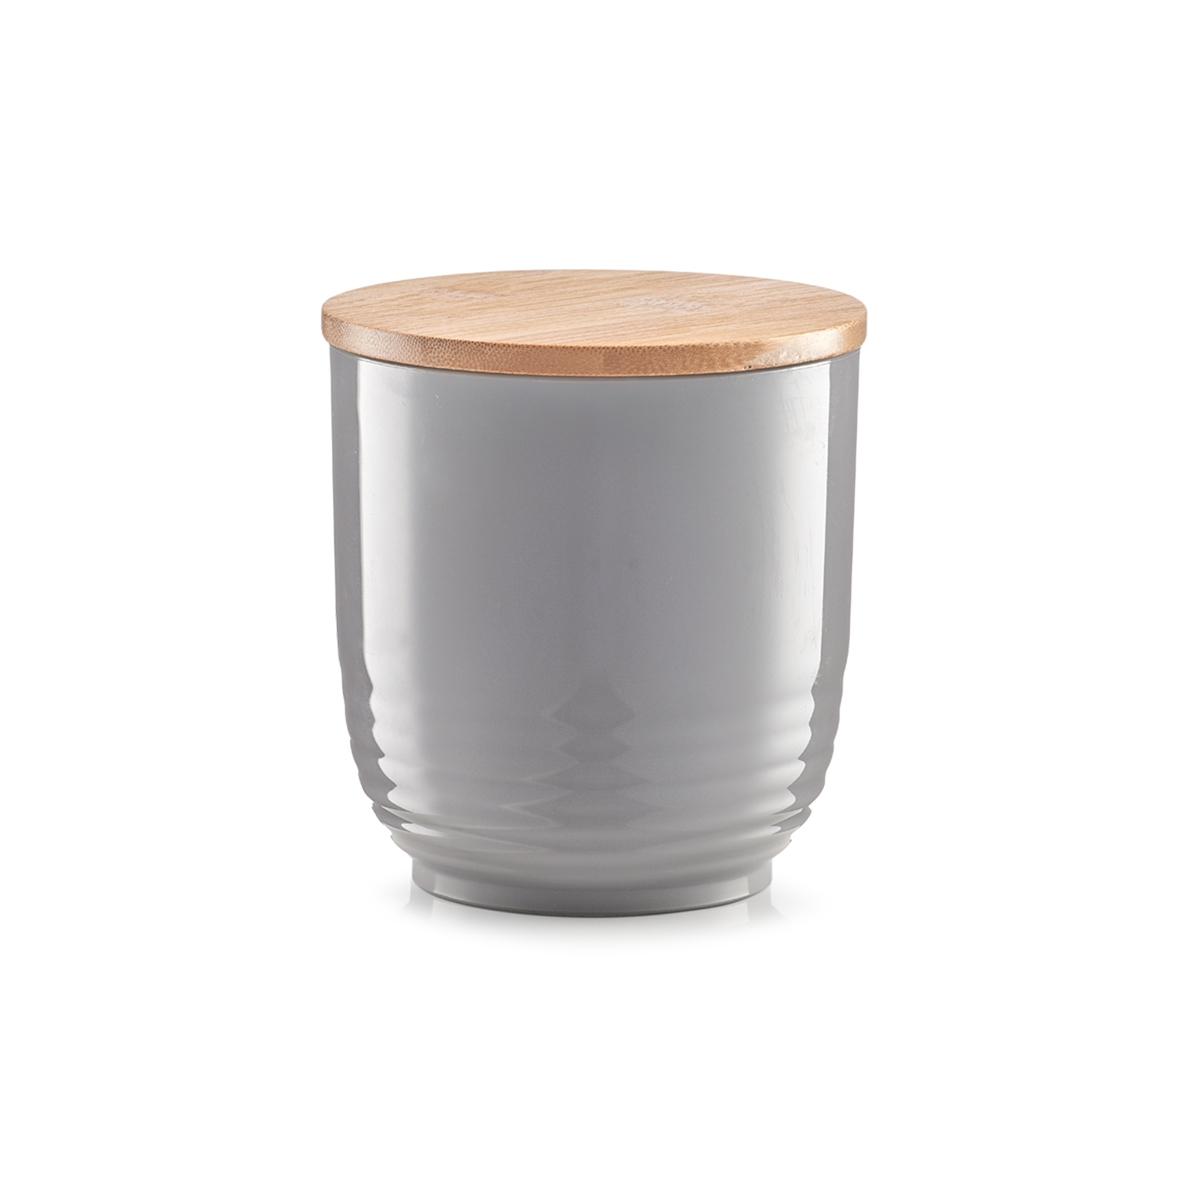 Recipient pentru depozitare cu capac din bambus, Grey Polistiren, Ø 12xH12,5 cm imagine